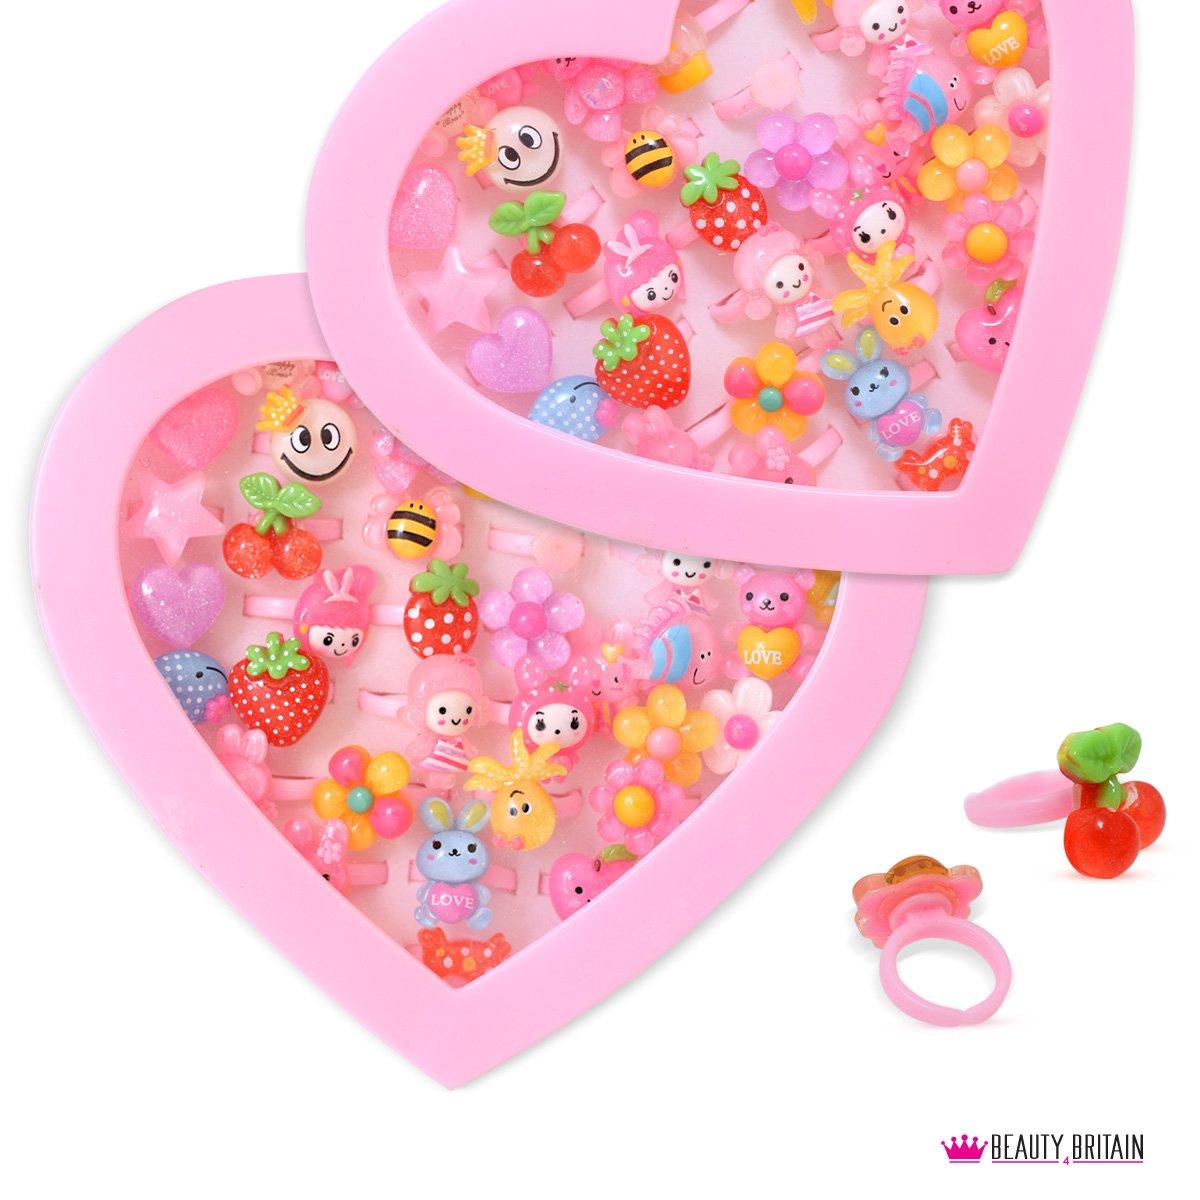 36x Anillos Luxury infantil de joyas Corazón Buzón ajustable tamaño B4B